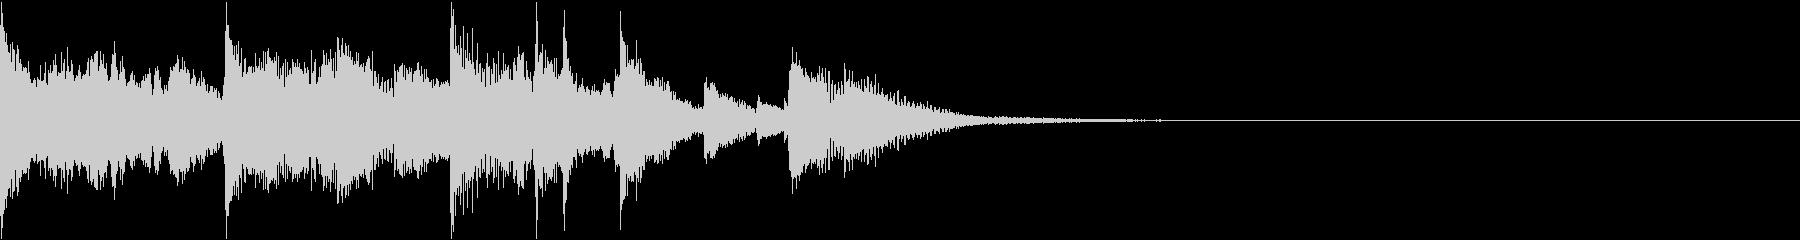 Refreshing violin / sound logo's unreproduced waveform